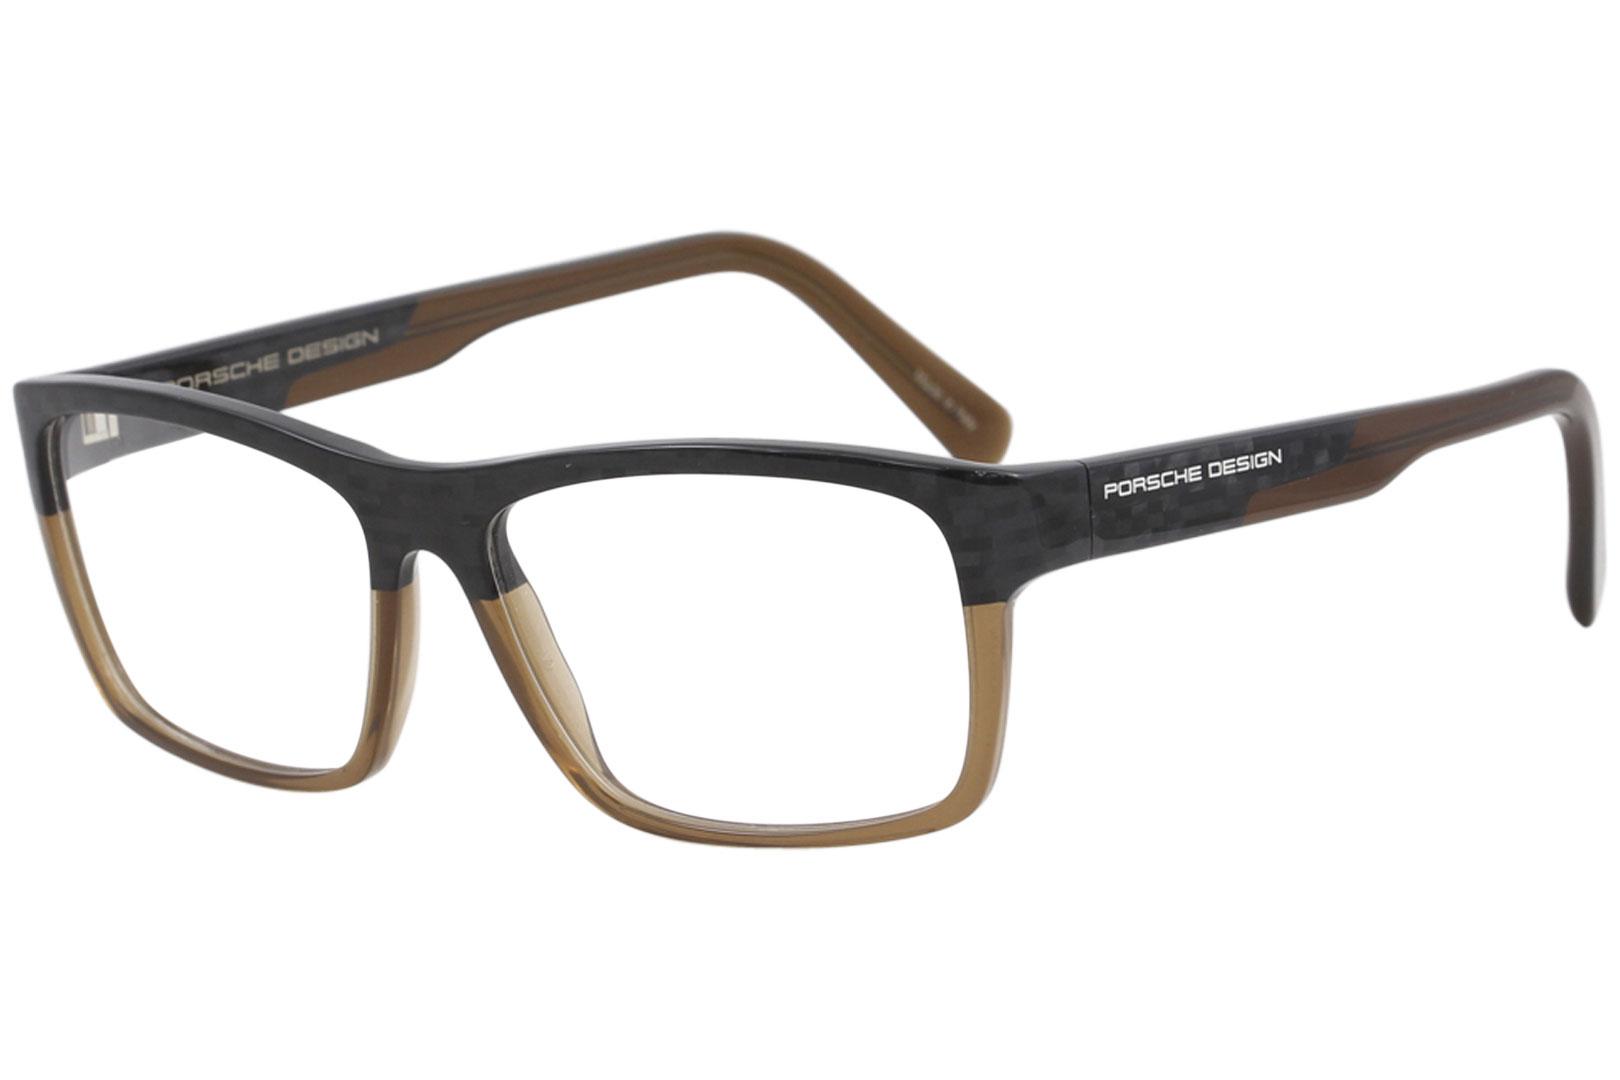 9643800261 Porsche Design Men s Eyeglasses P8190 P 8190 C Carbon Brown Optical ...